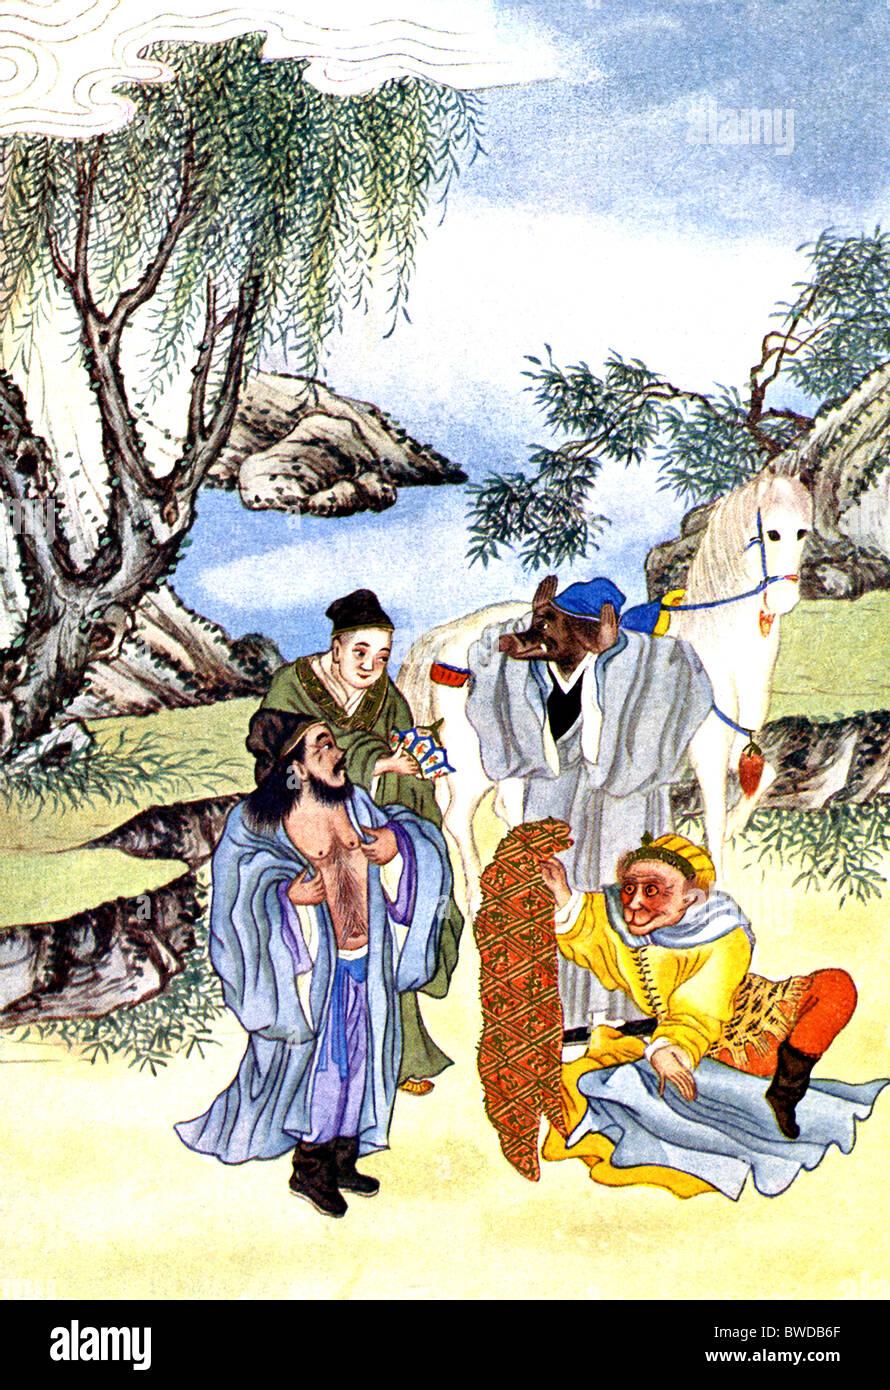 Der Priester Hsuan Chuang, bekannt als der Meister, reiste mit der Sonne, der Affengott, Land, dass exterminiert Stockbild